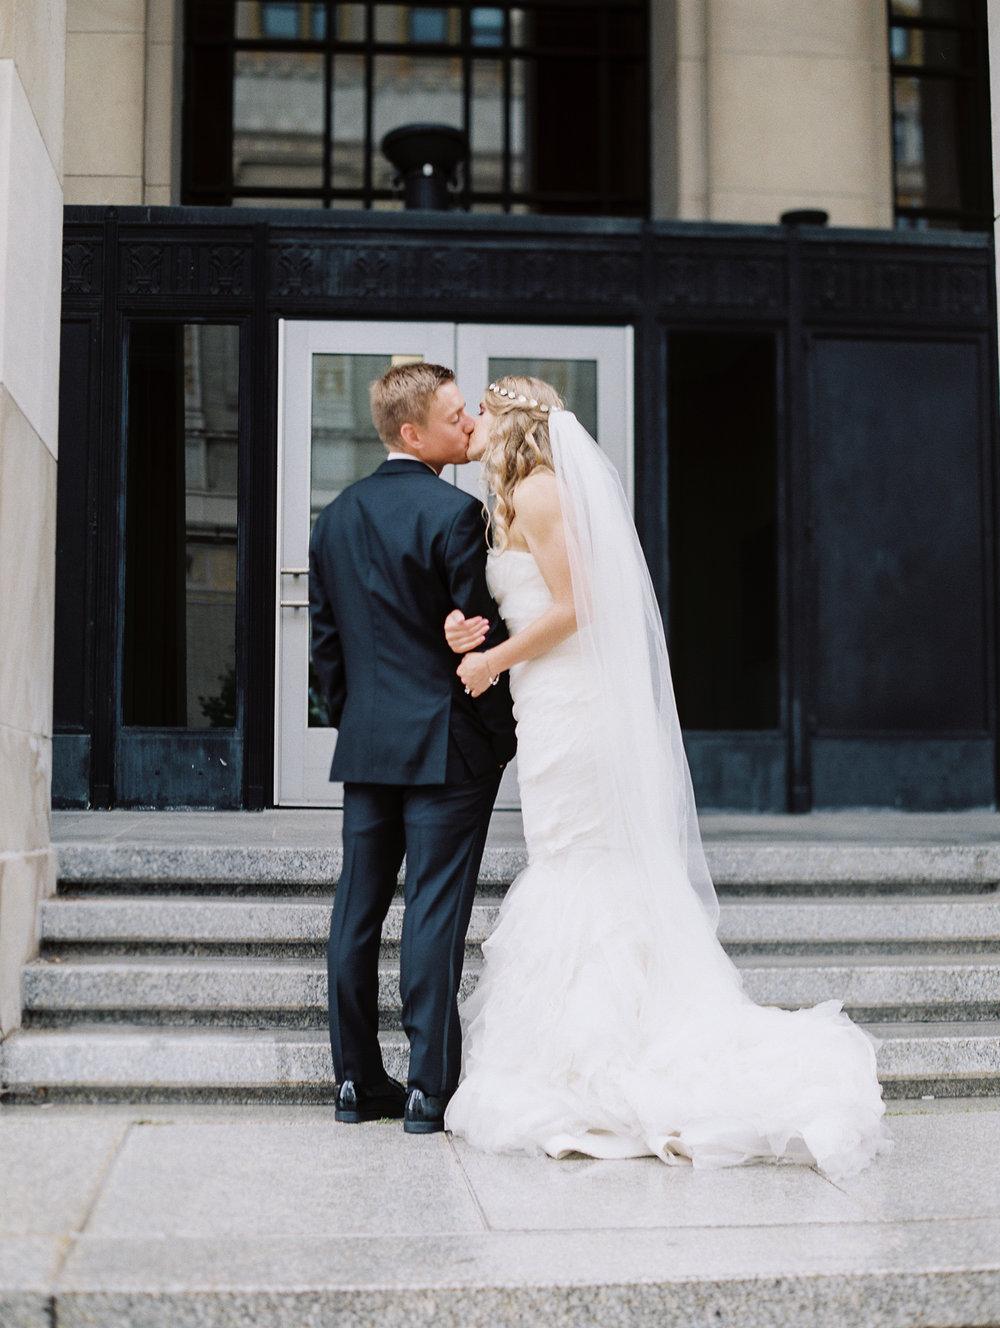 Zawisza Wedding f ASP©-7.jpg